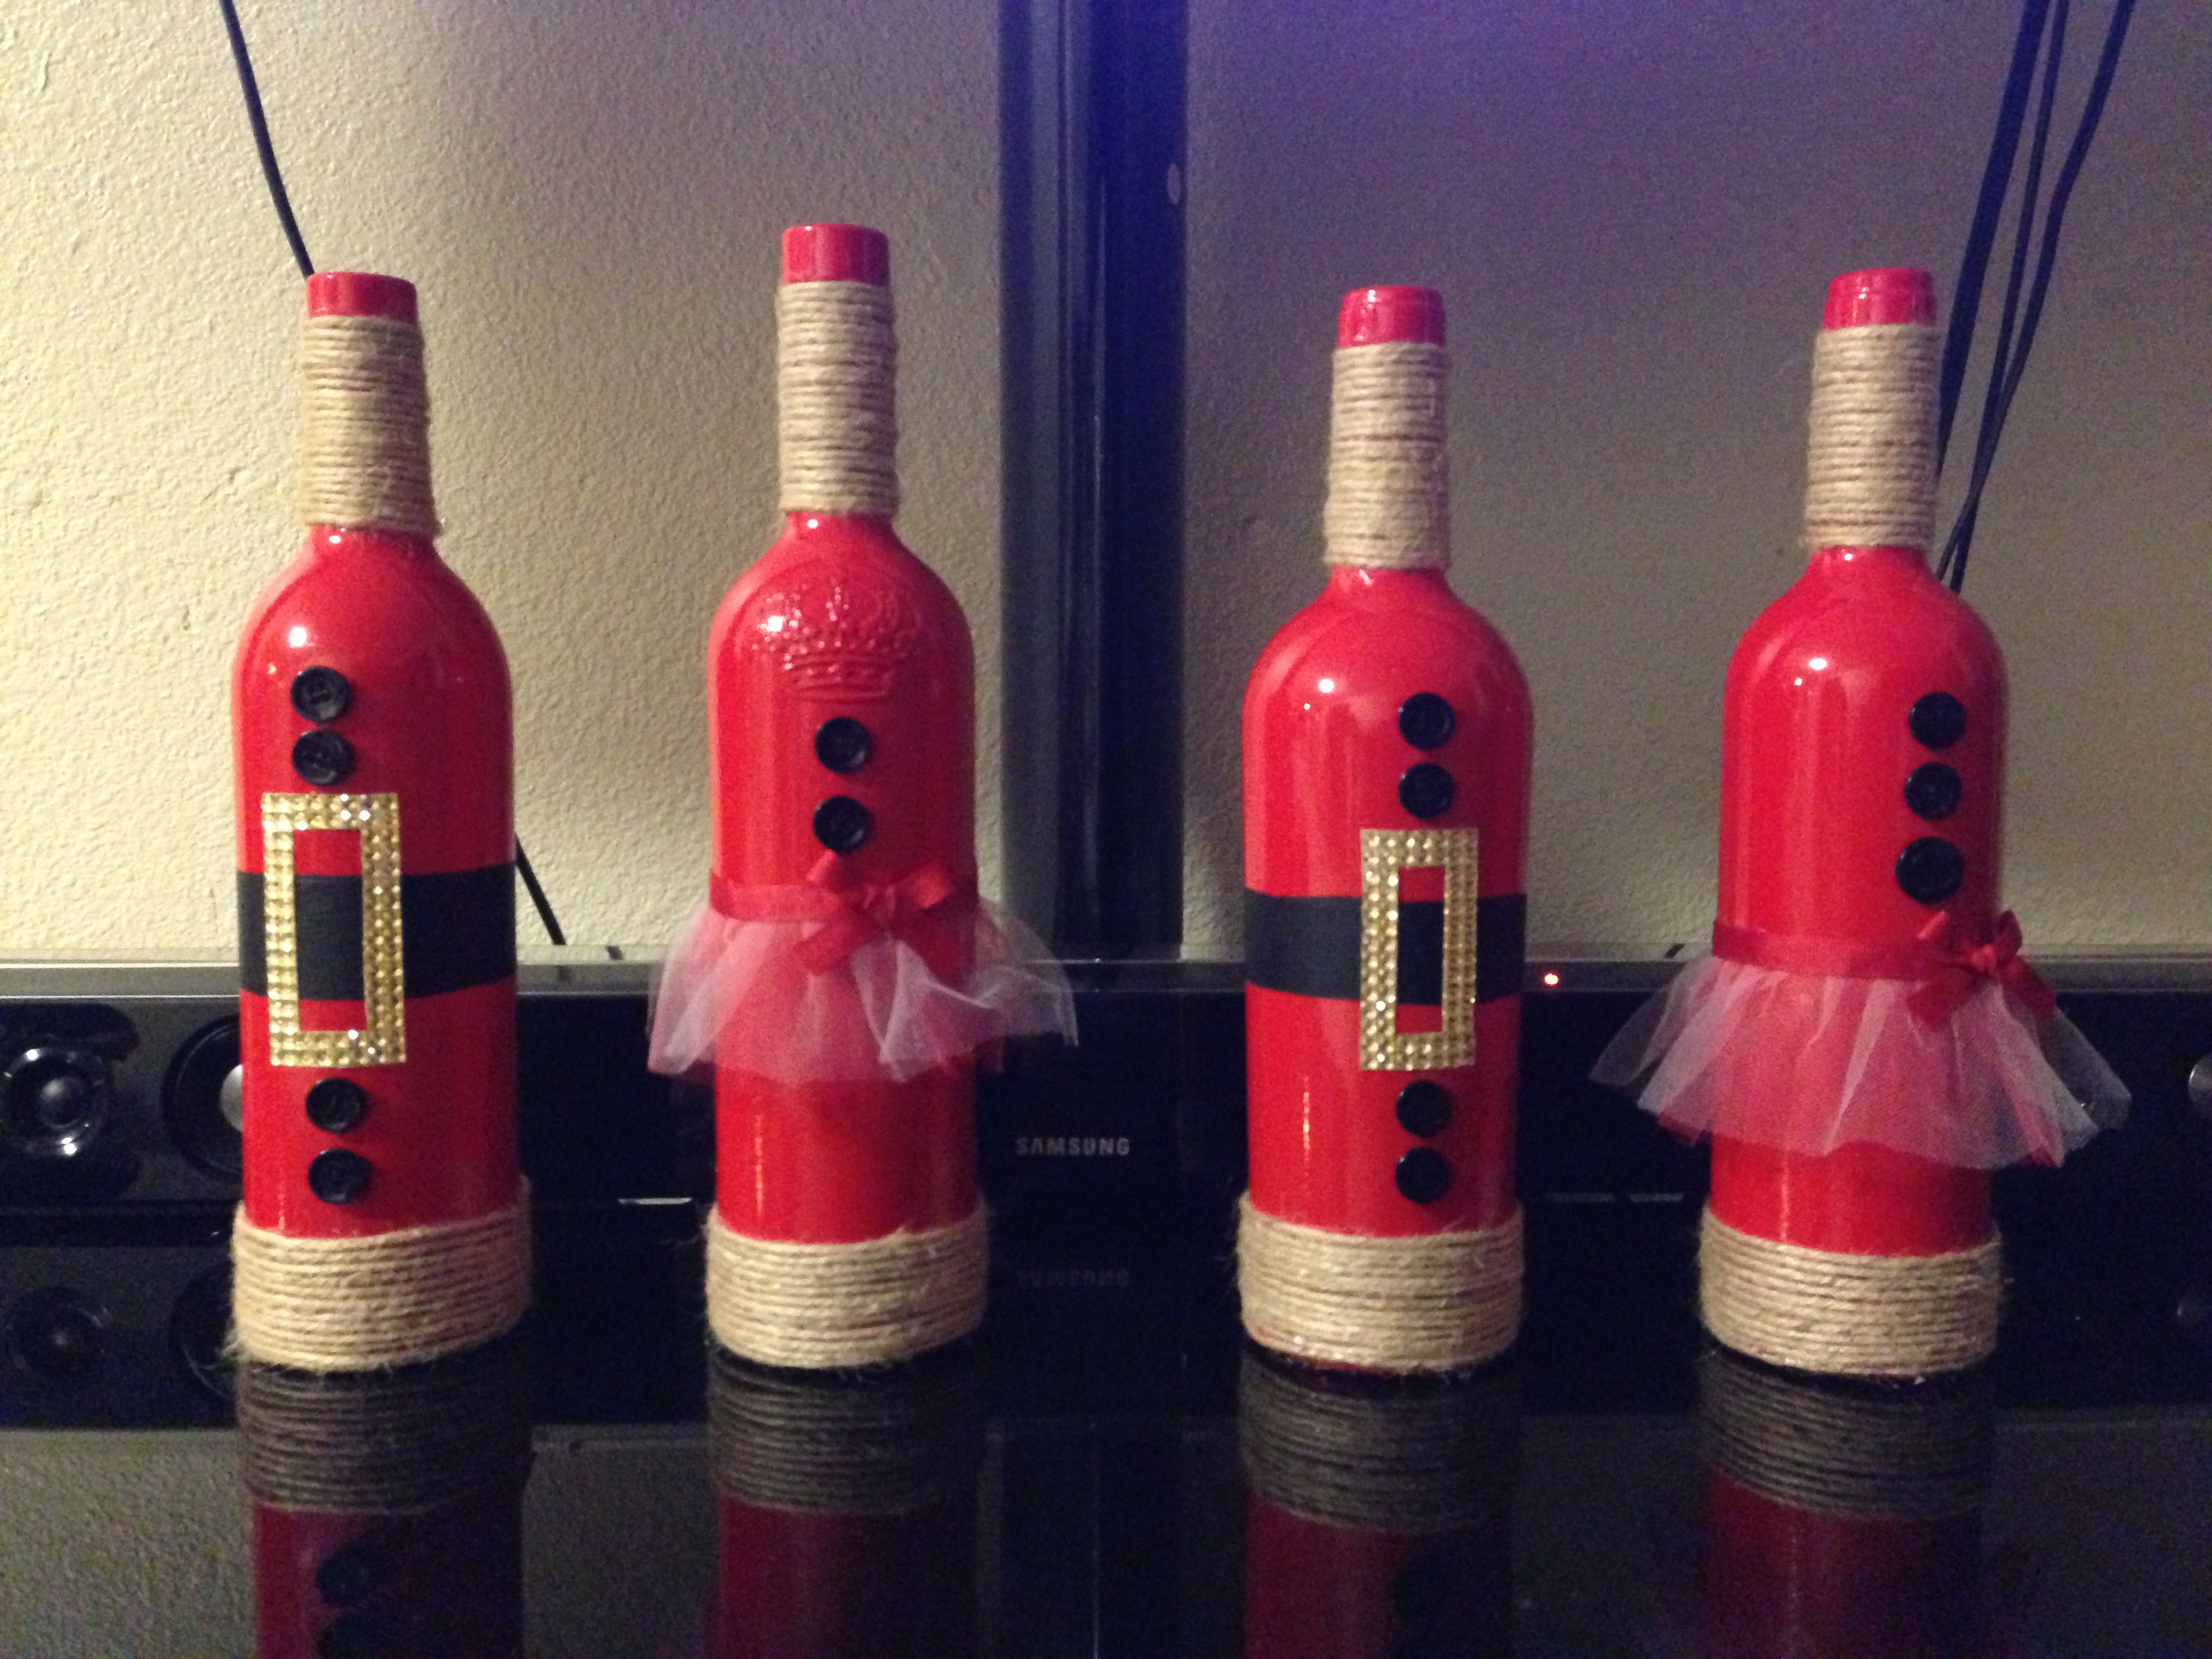 Bottle Christmas Decoration Diy Santa's Family Turn Your Wine Bottles Into Cute Christmas